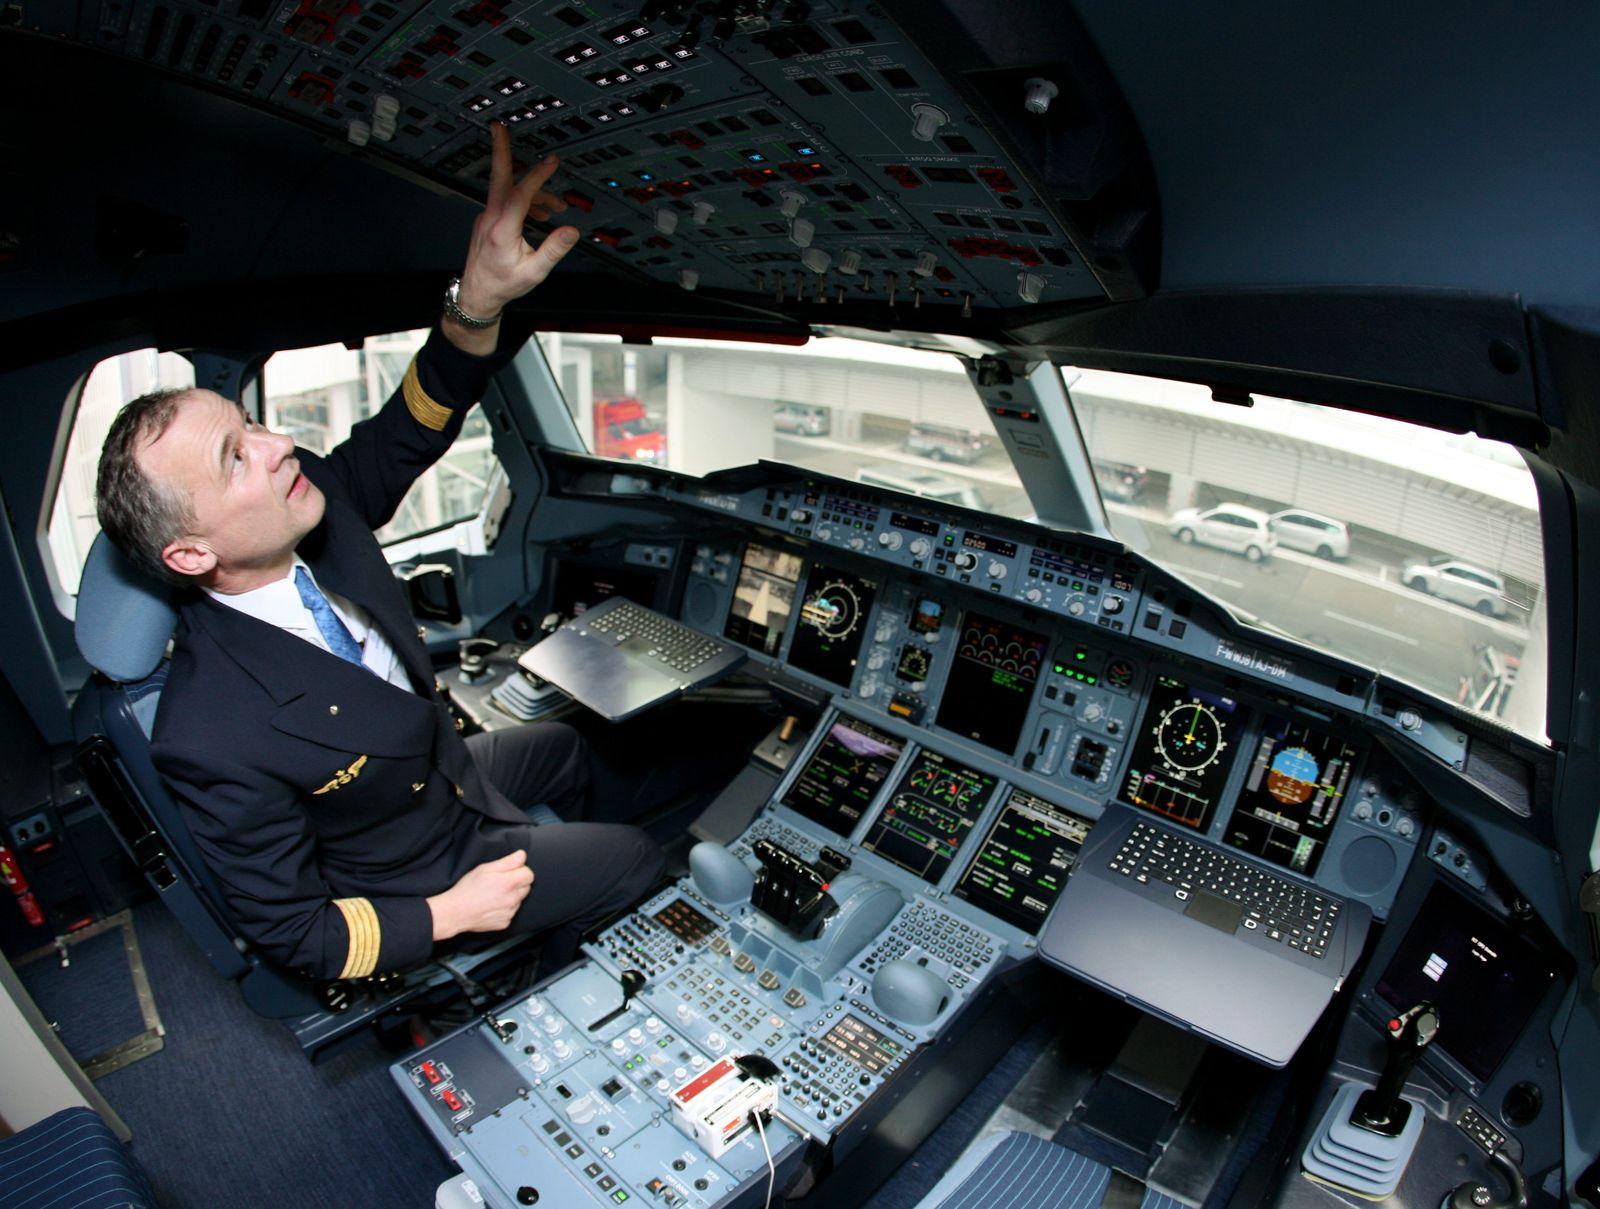 Lufthansa / Cockpit / Pilot